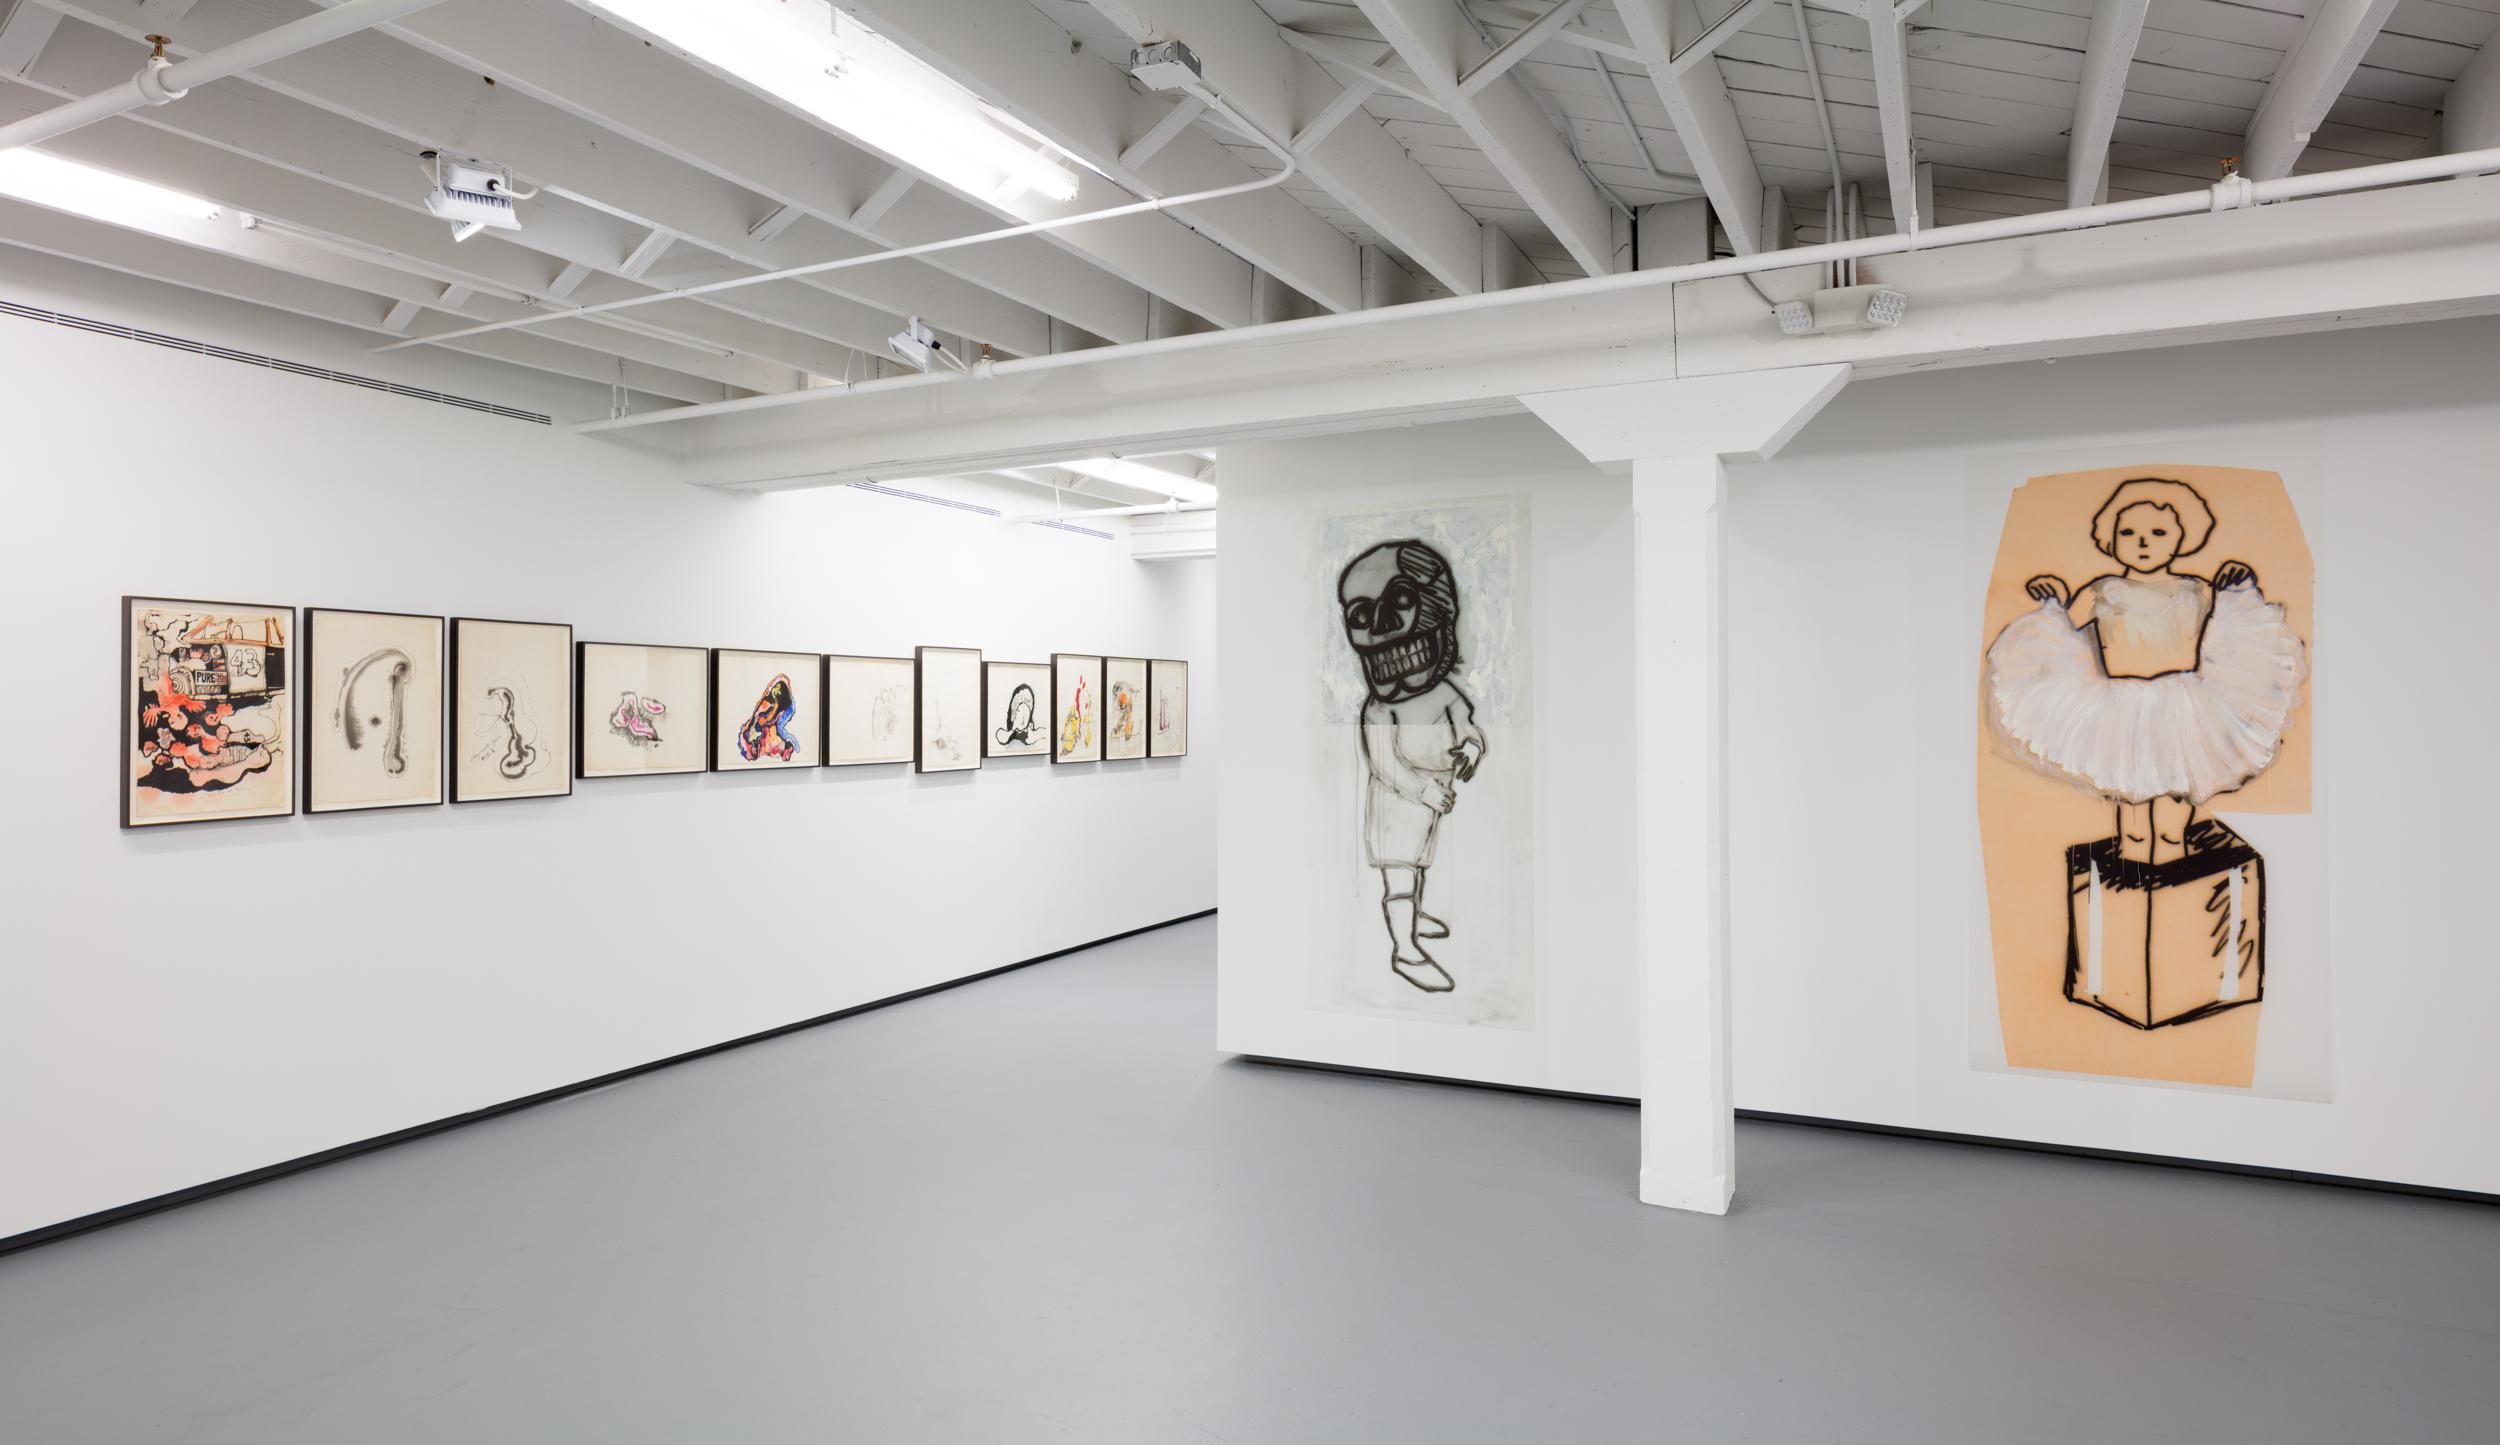 Image of work by Ida Applebroog